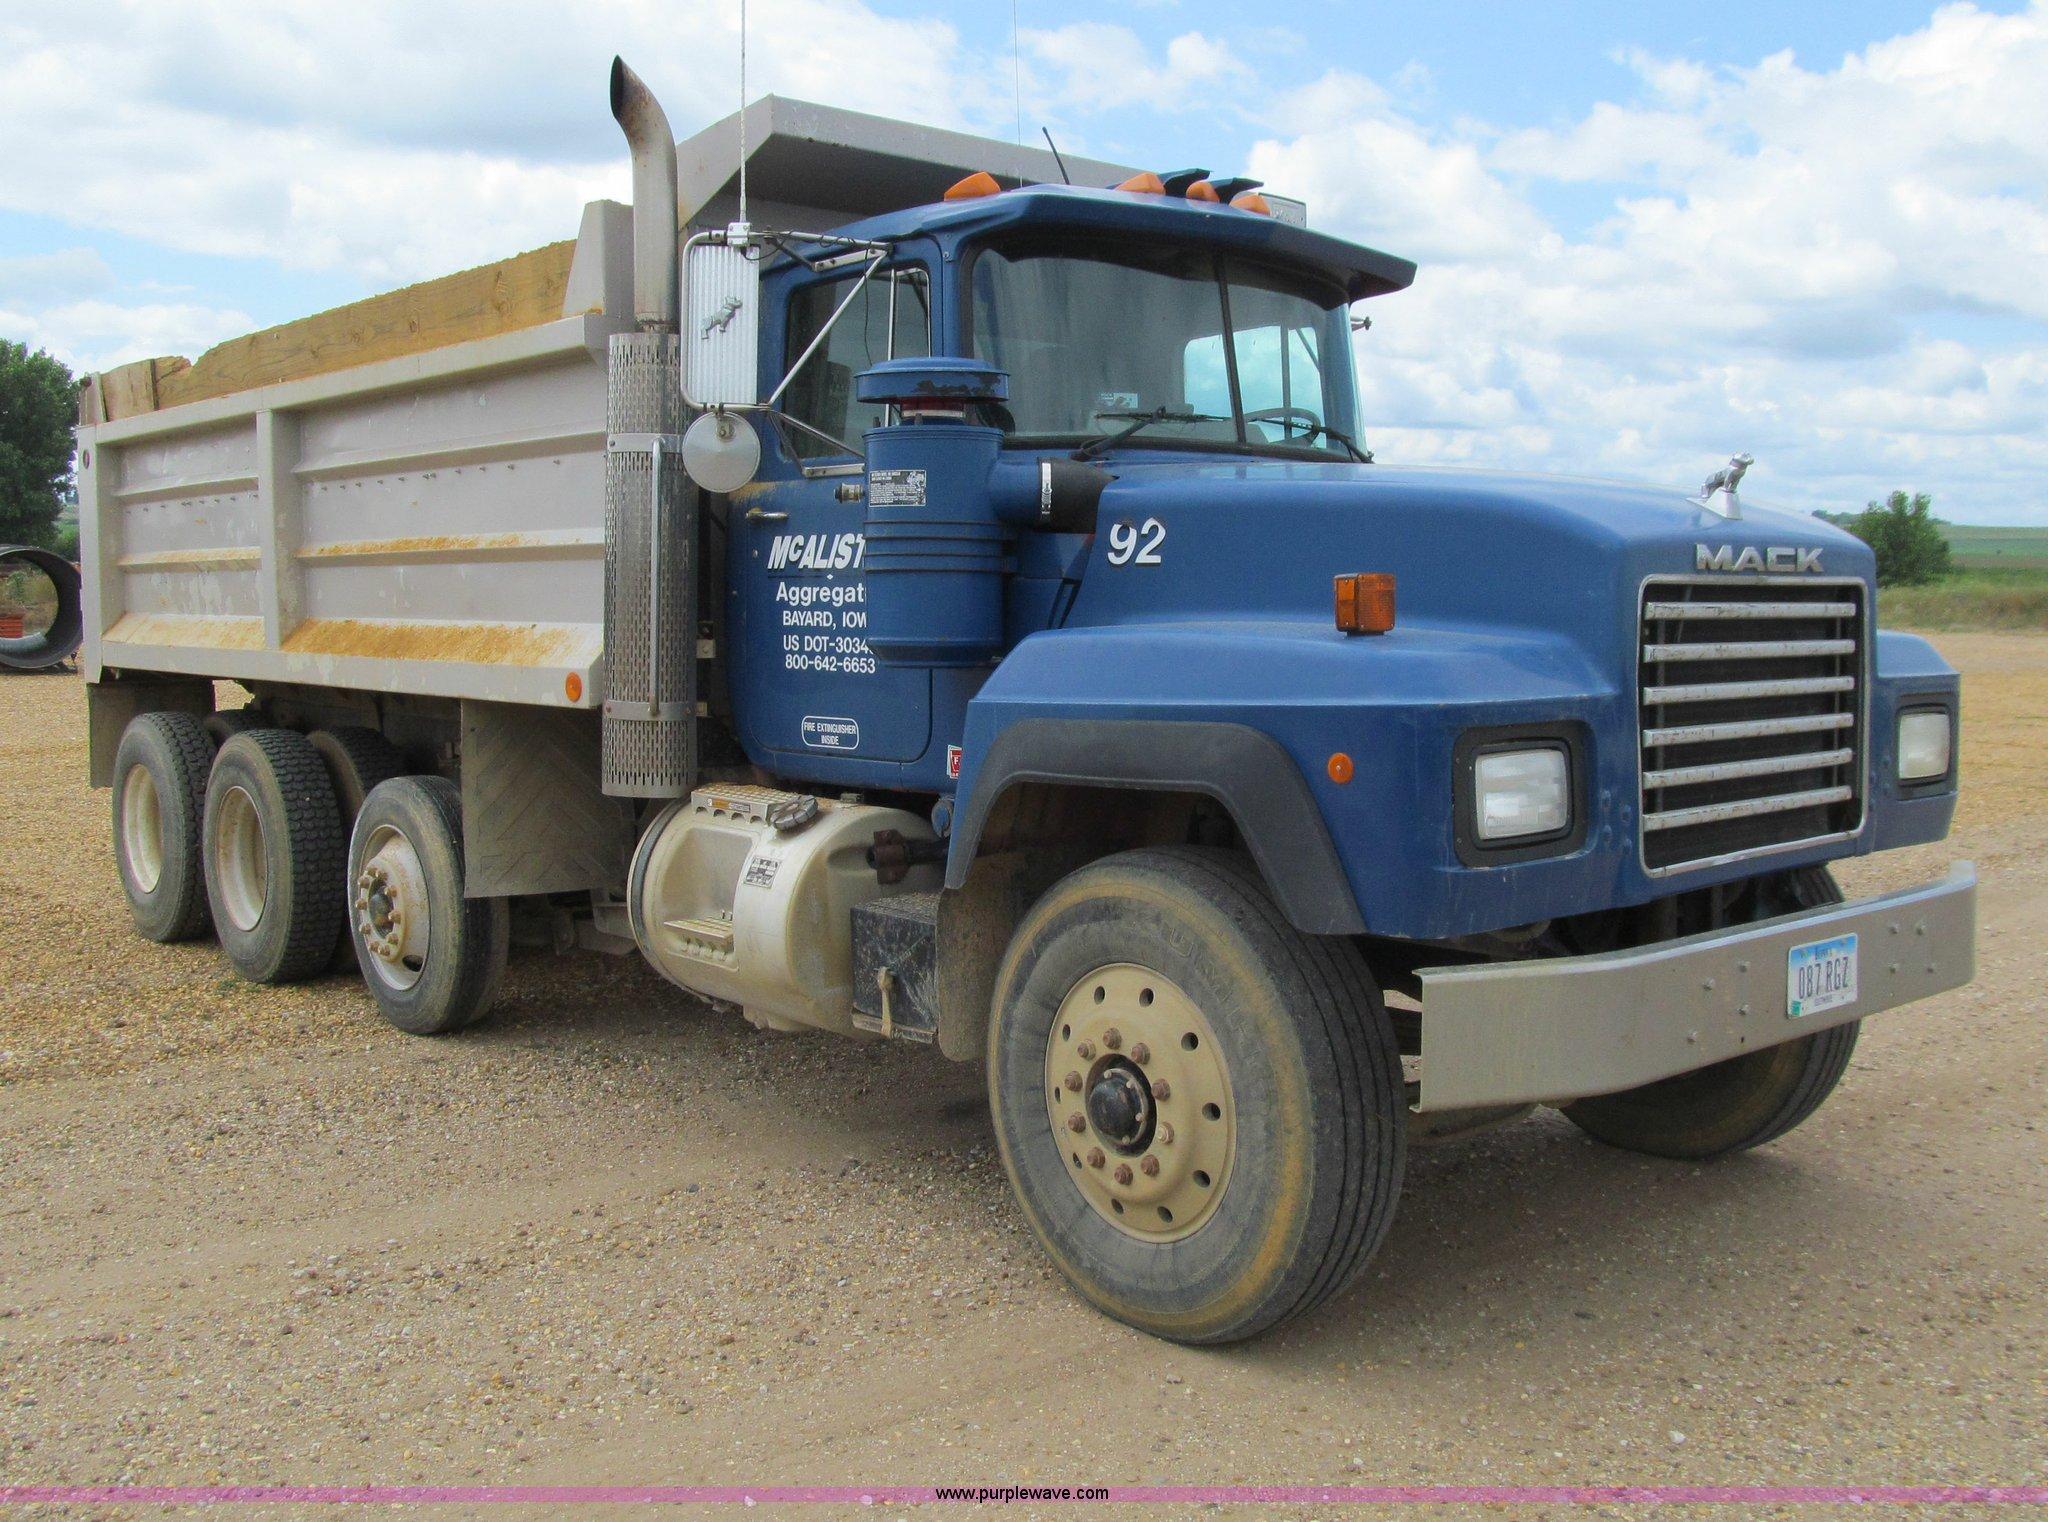 Mack Dump Truck Trailer Wiring Diagram 1992 Rd688s Item E4932 Sold September 2 Construction And